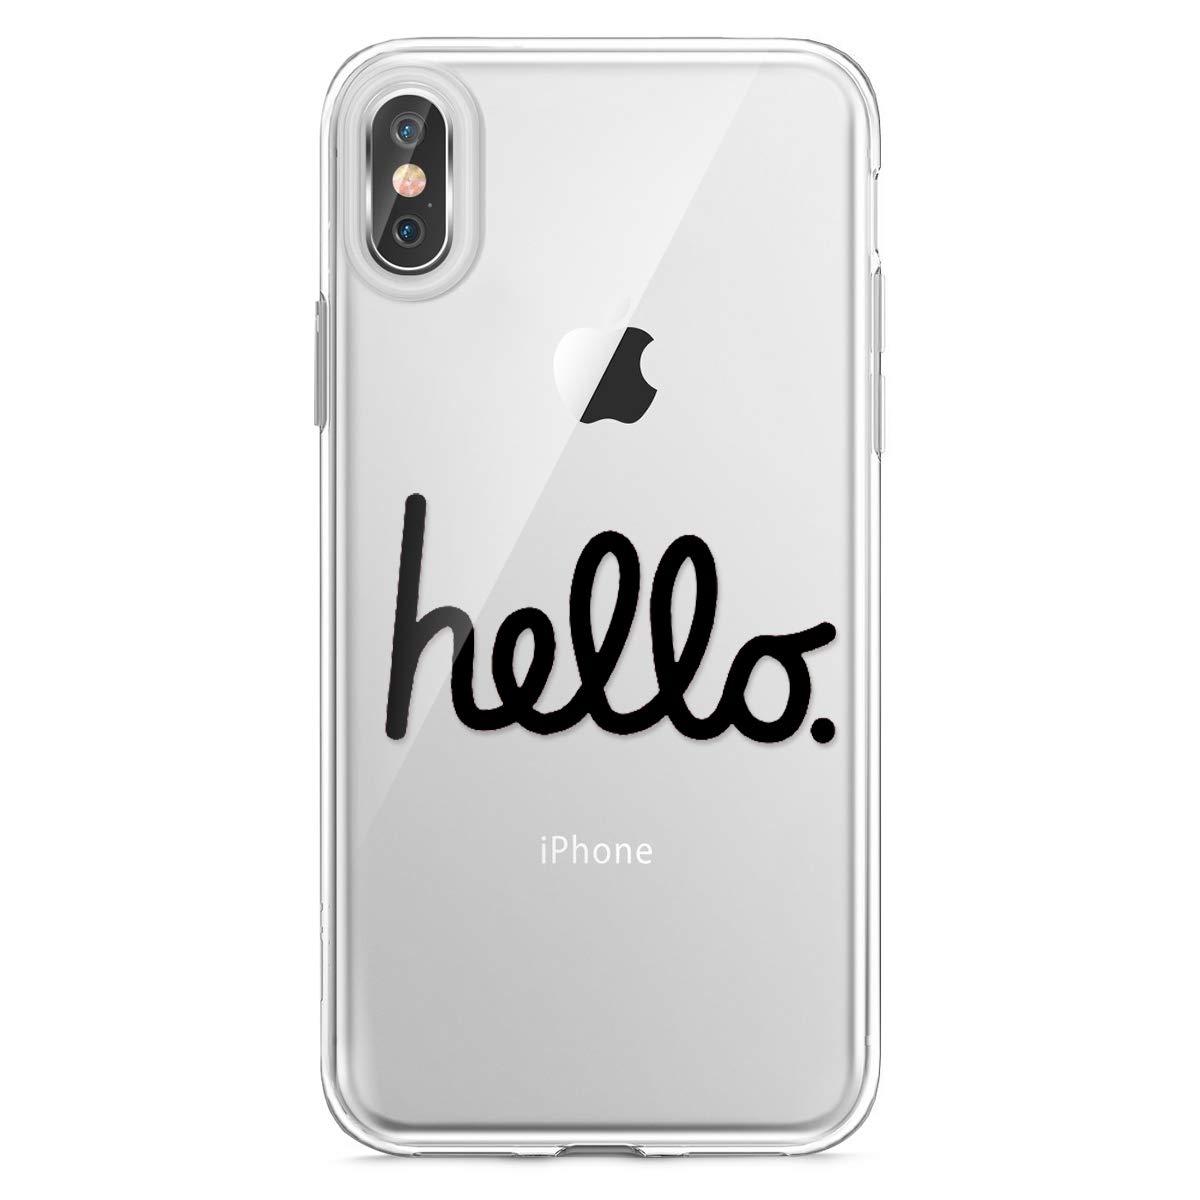 Funda Compatible con iPhone XR,Carcasa Compatible con iPhone XR Funda Silicona Suave,Transparente Pluma y Ingl/és Frase Patr/ón Ultra Fina Brillante Crystal Clear Silicona TPU Case